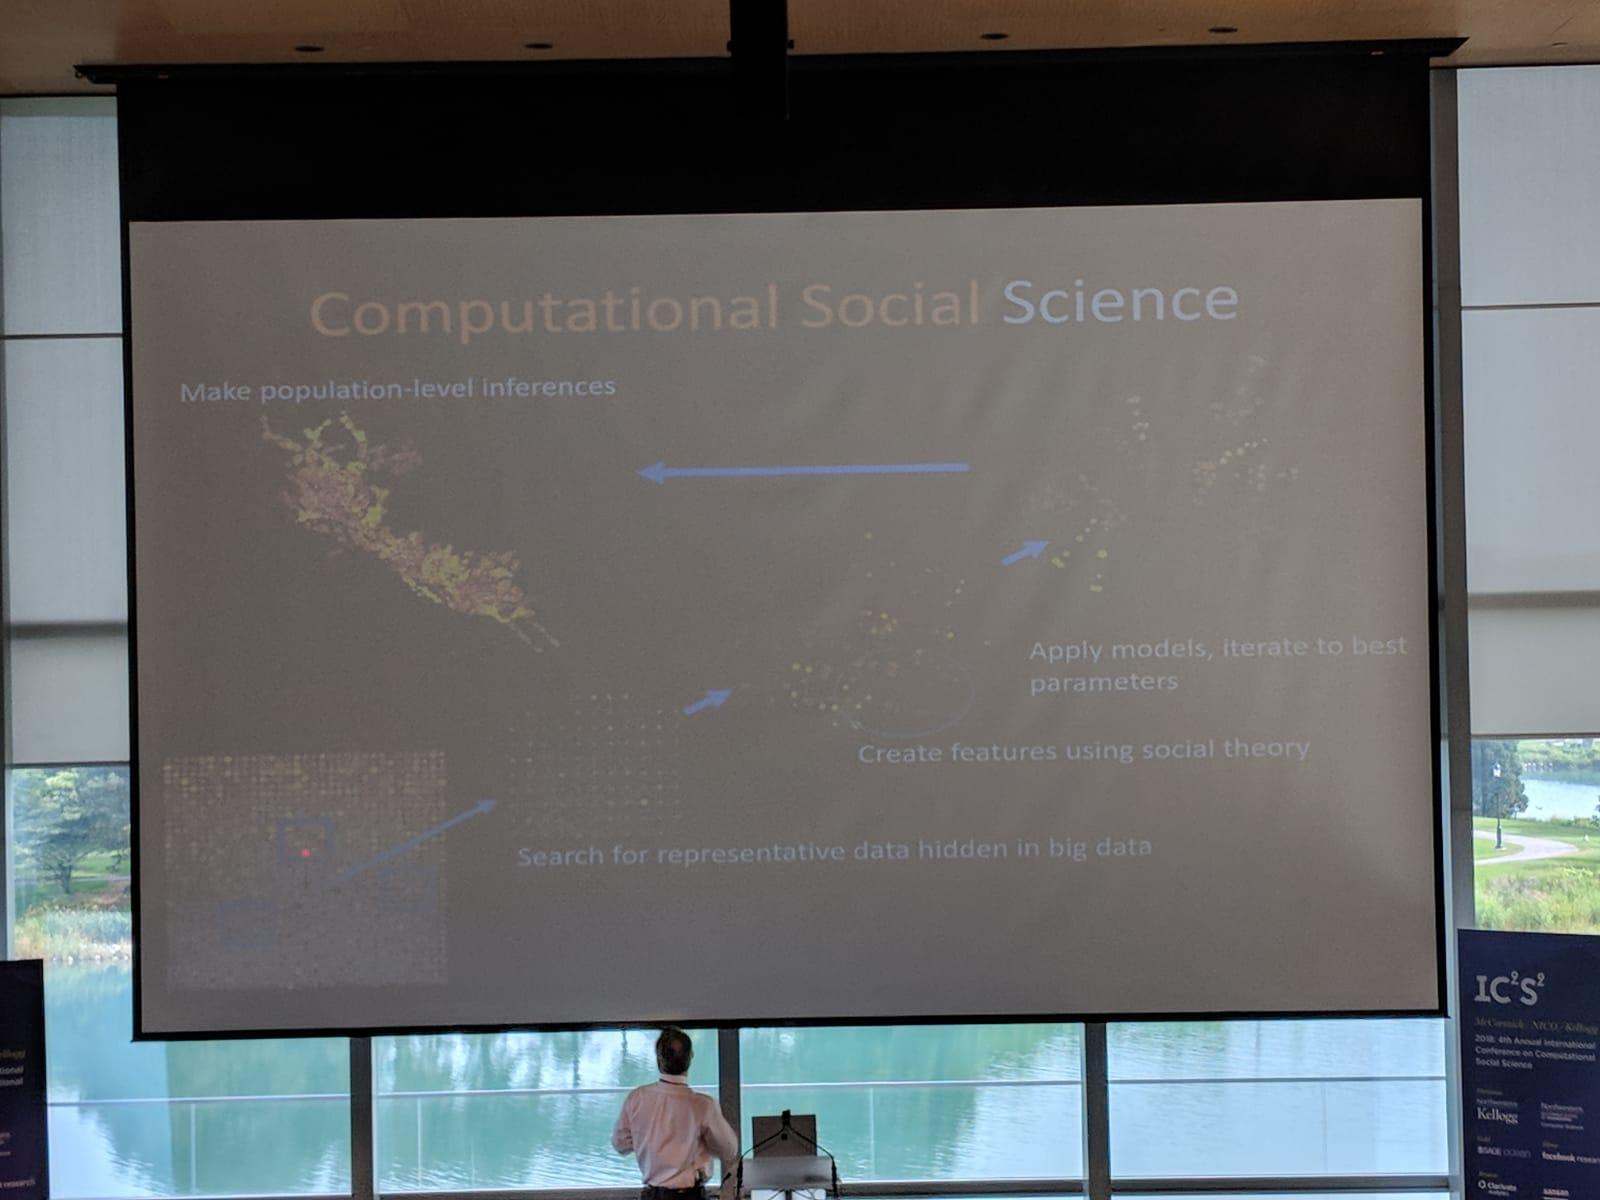 David Lazer's IC2S2 Presentation